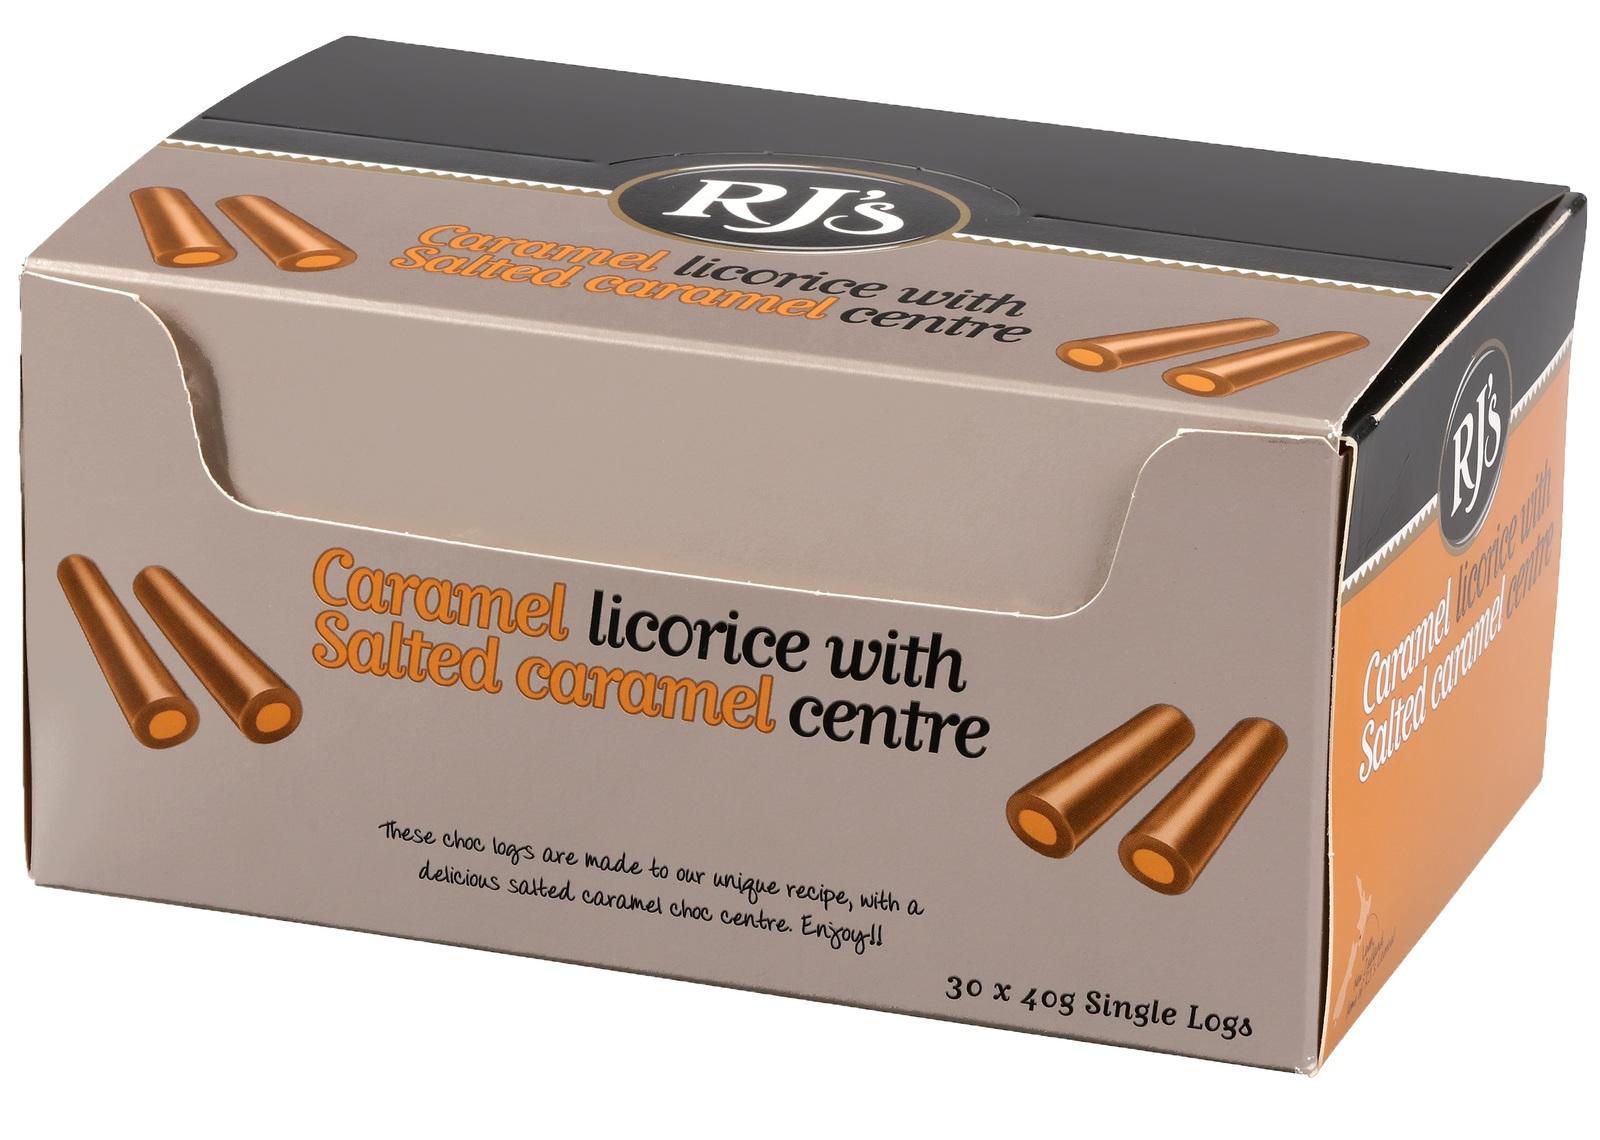 Rj's Salted Choc Caramel Single Logs (30 Pieces) image